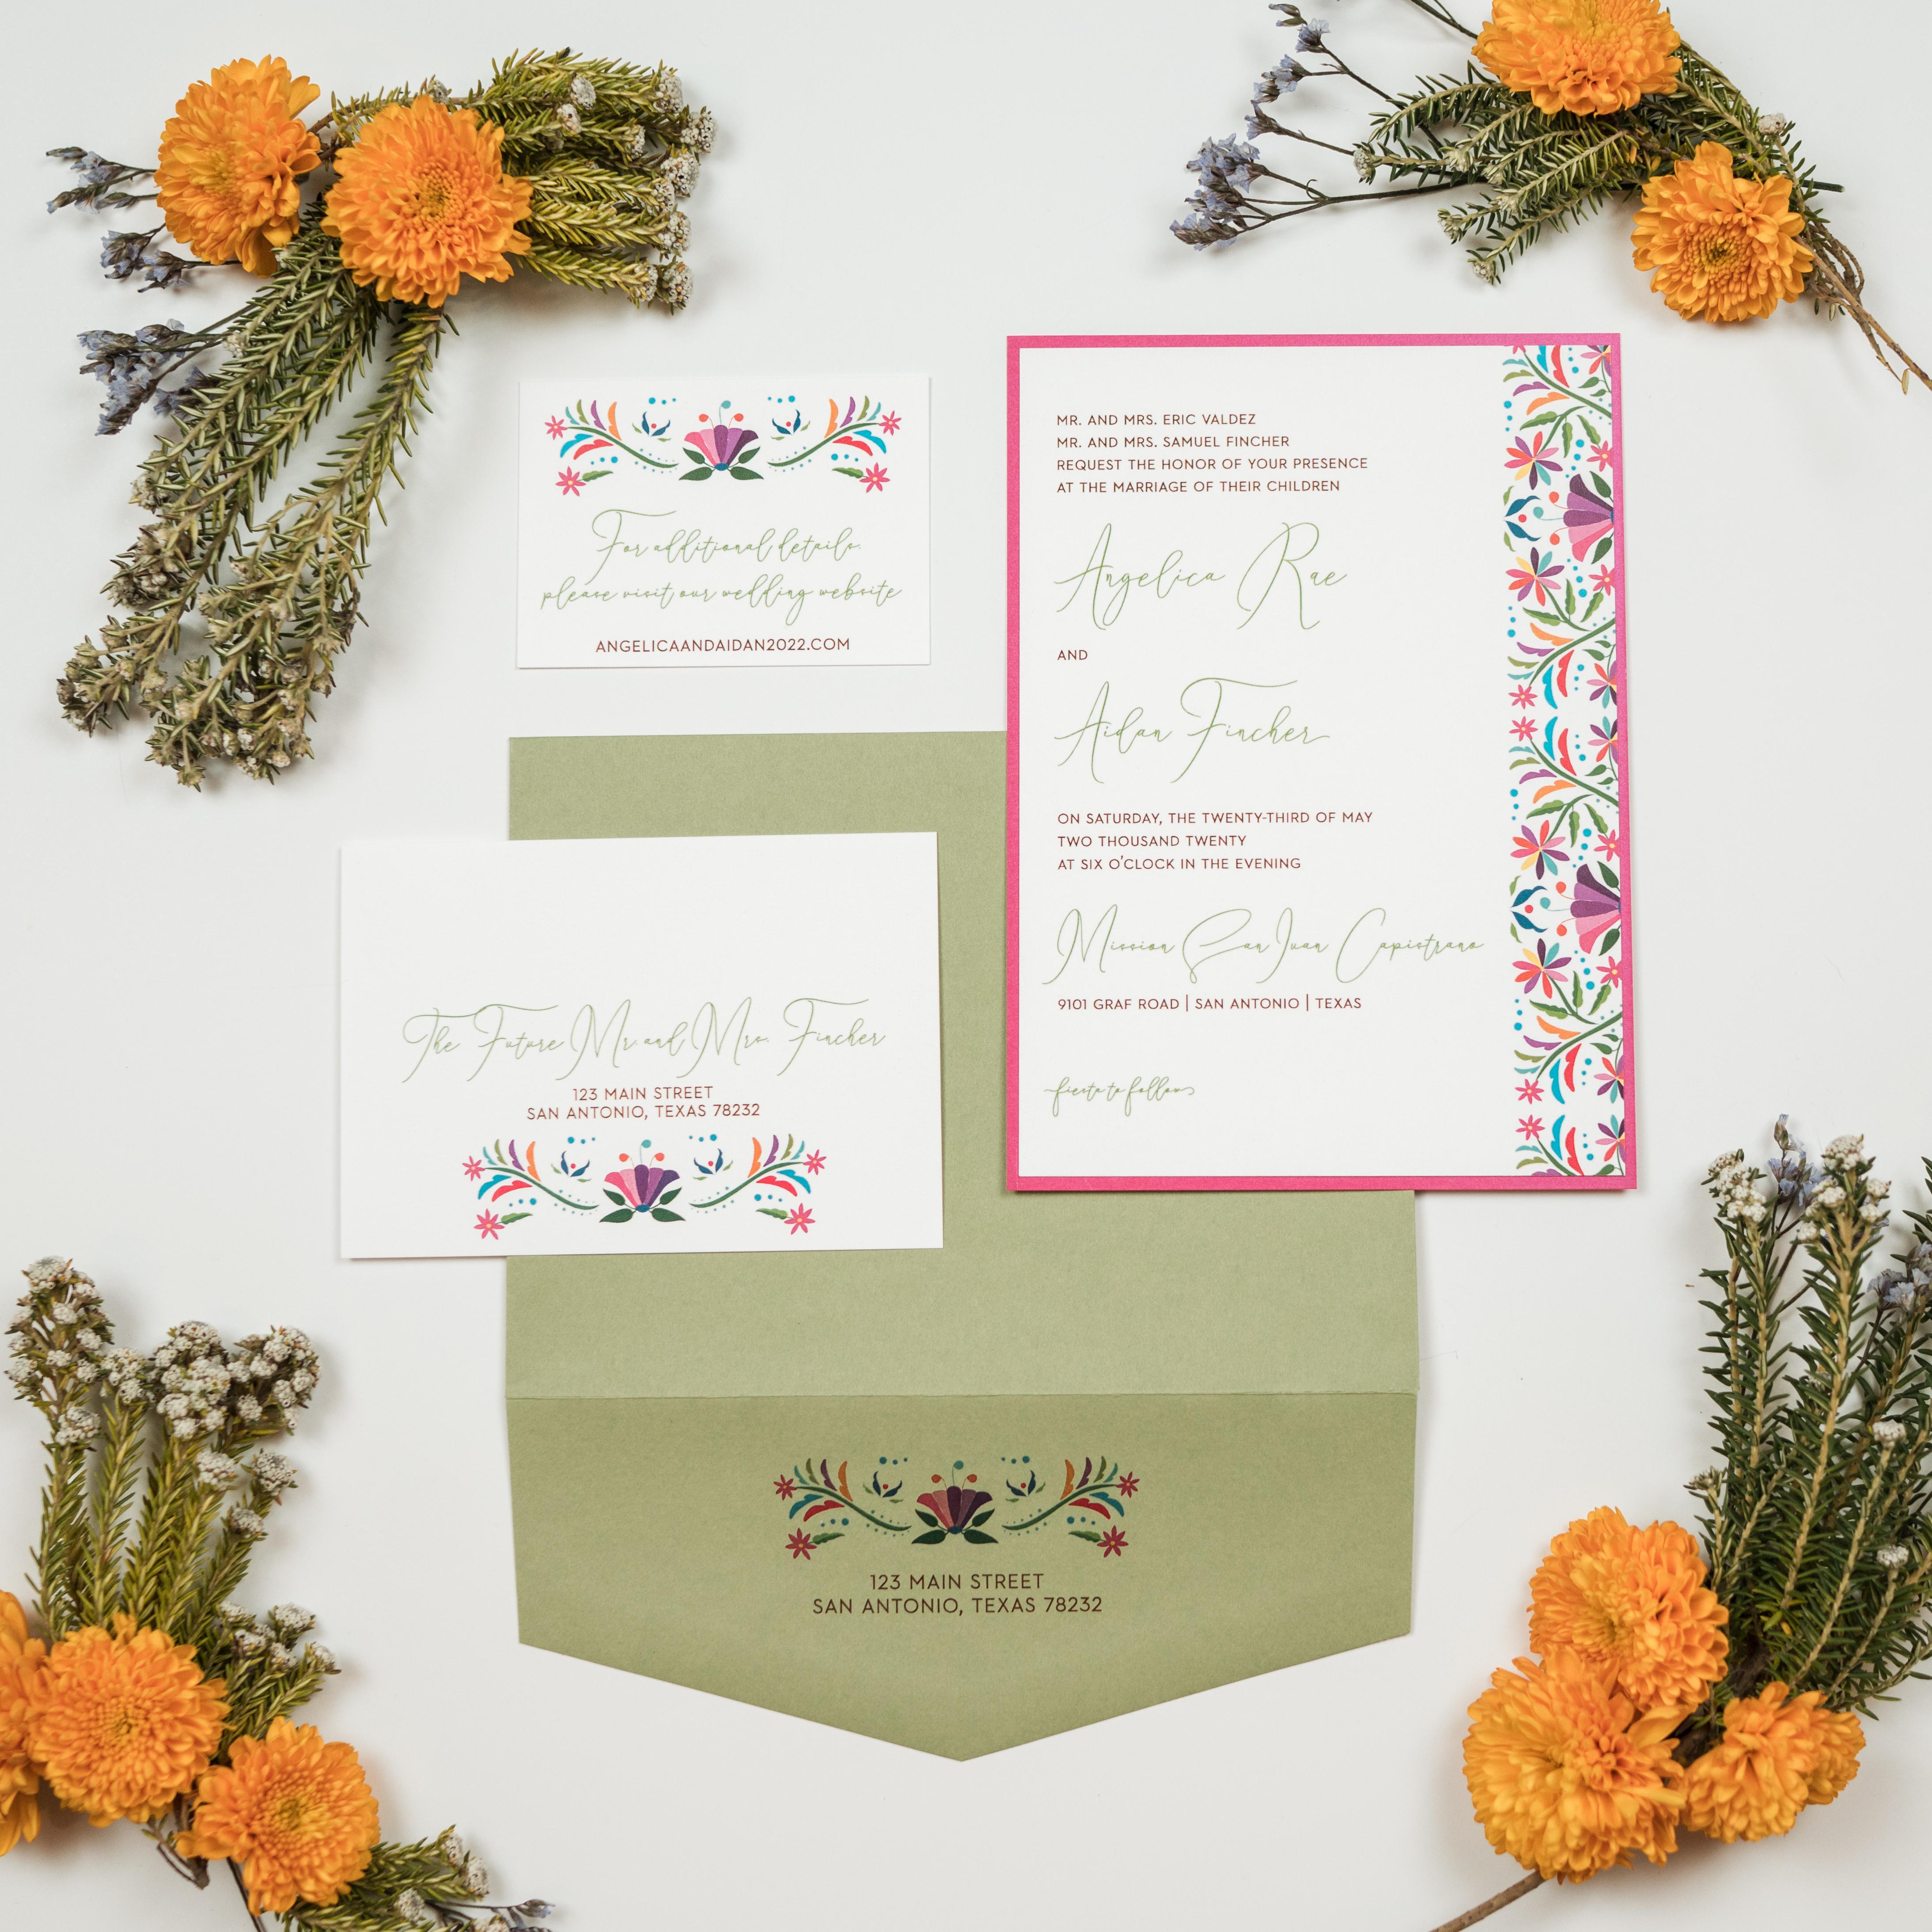 Fiesta Floral Wedding Invitation Suite - The Girl General